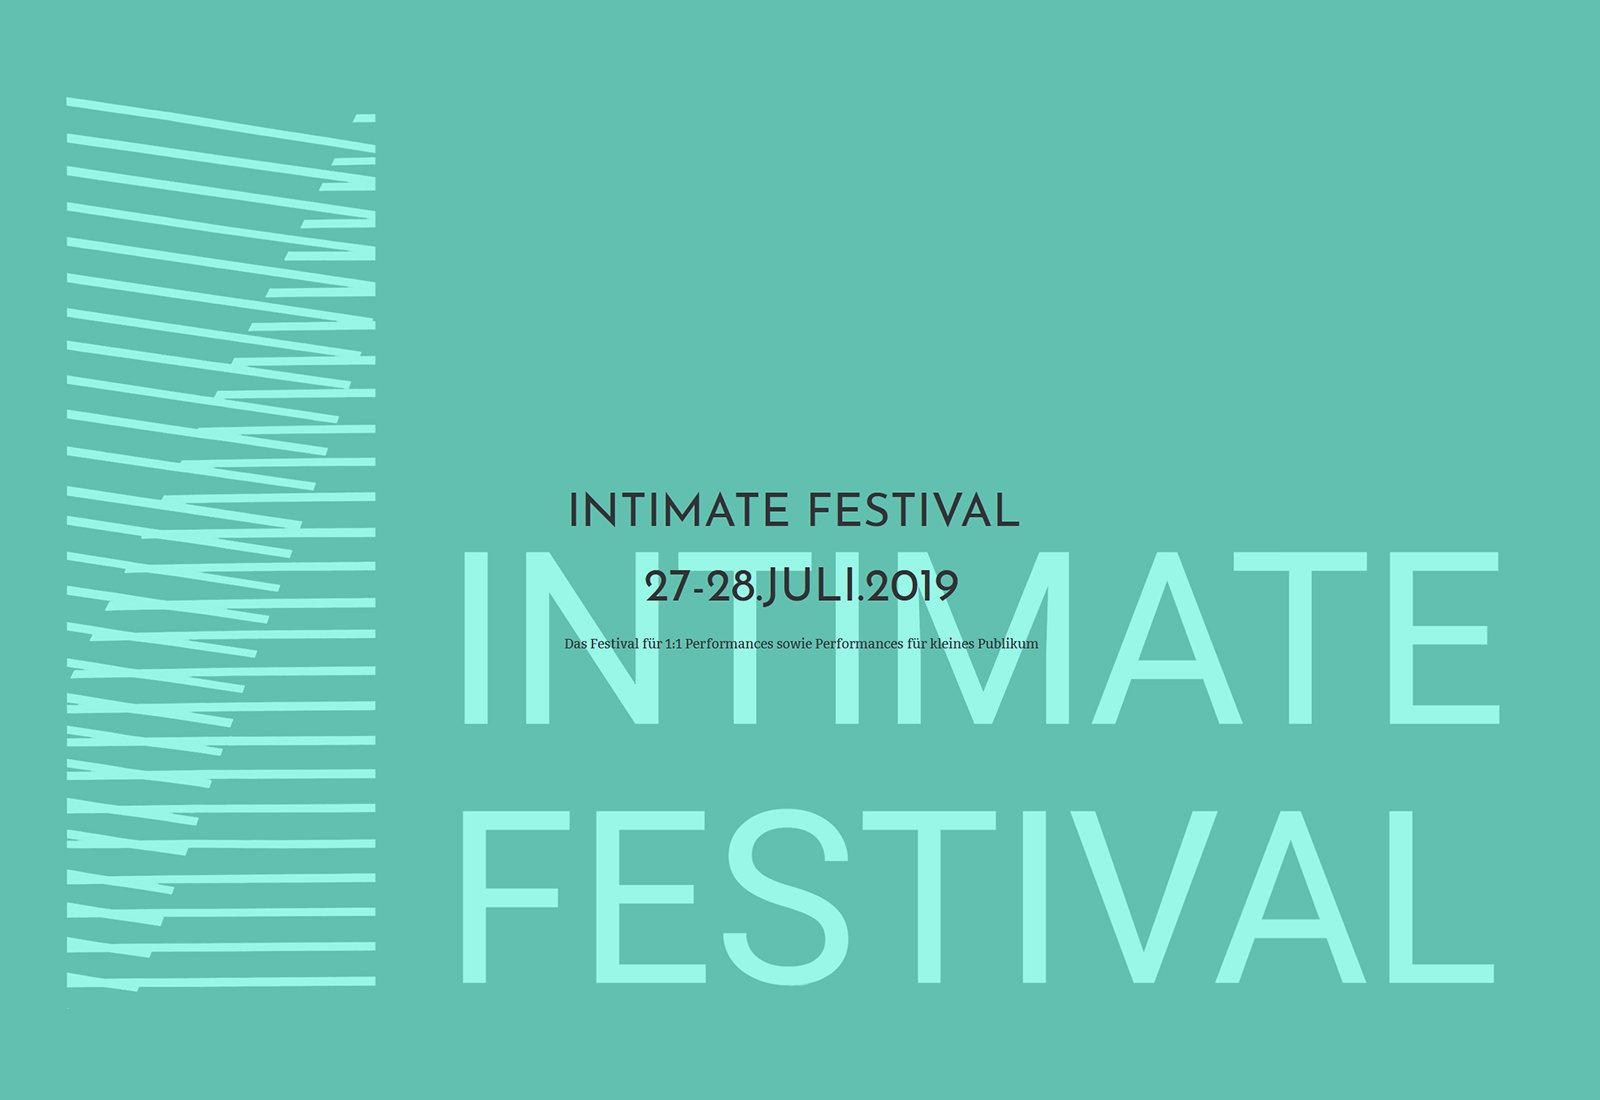 Intimate Festival 2019